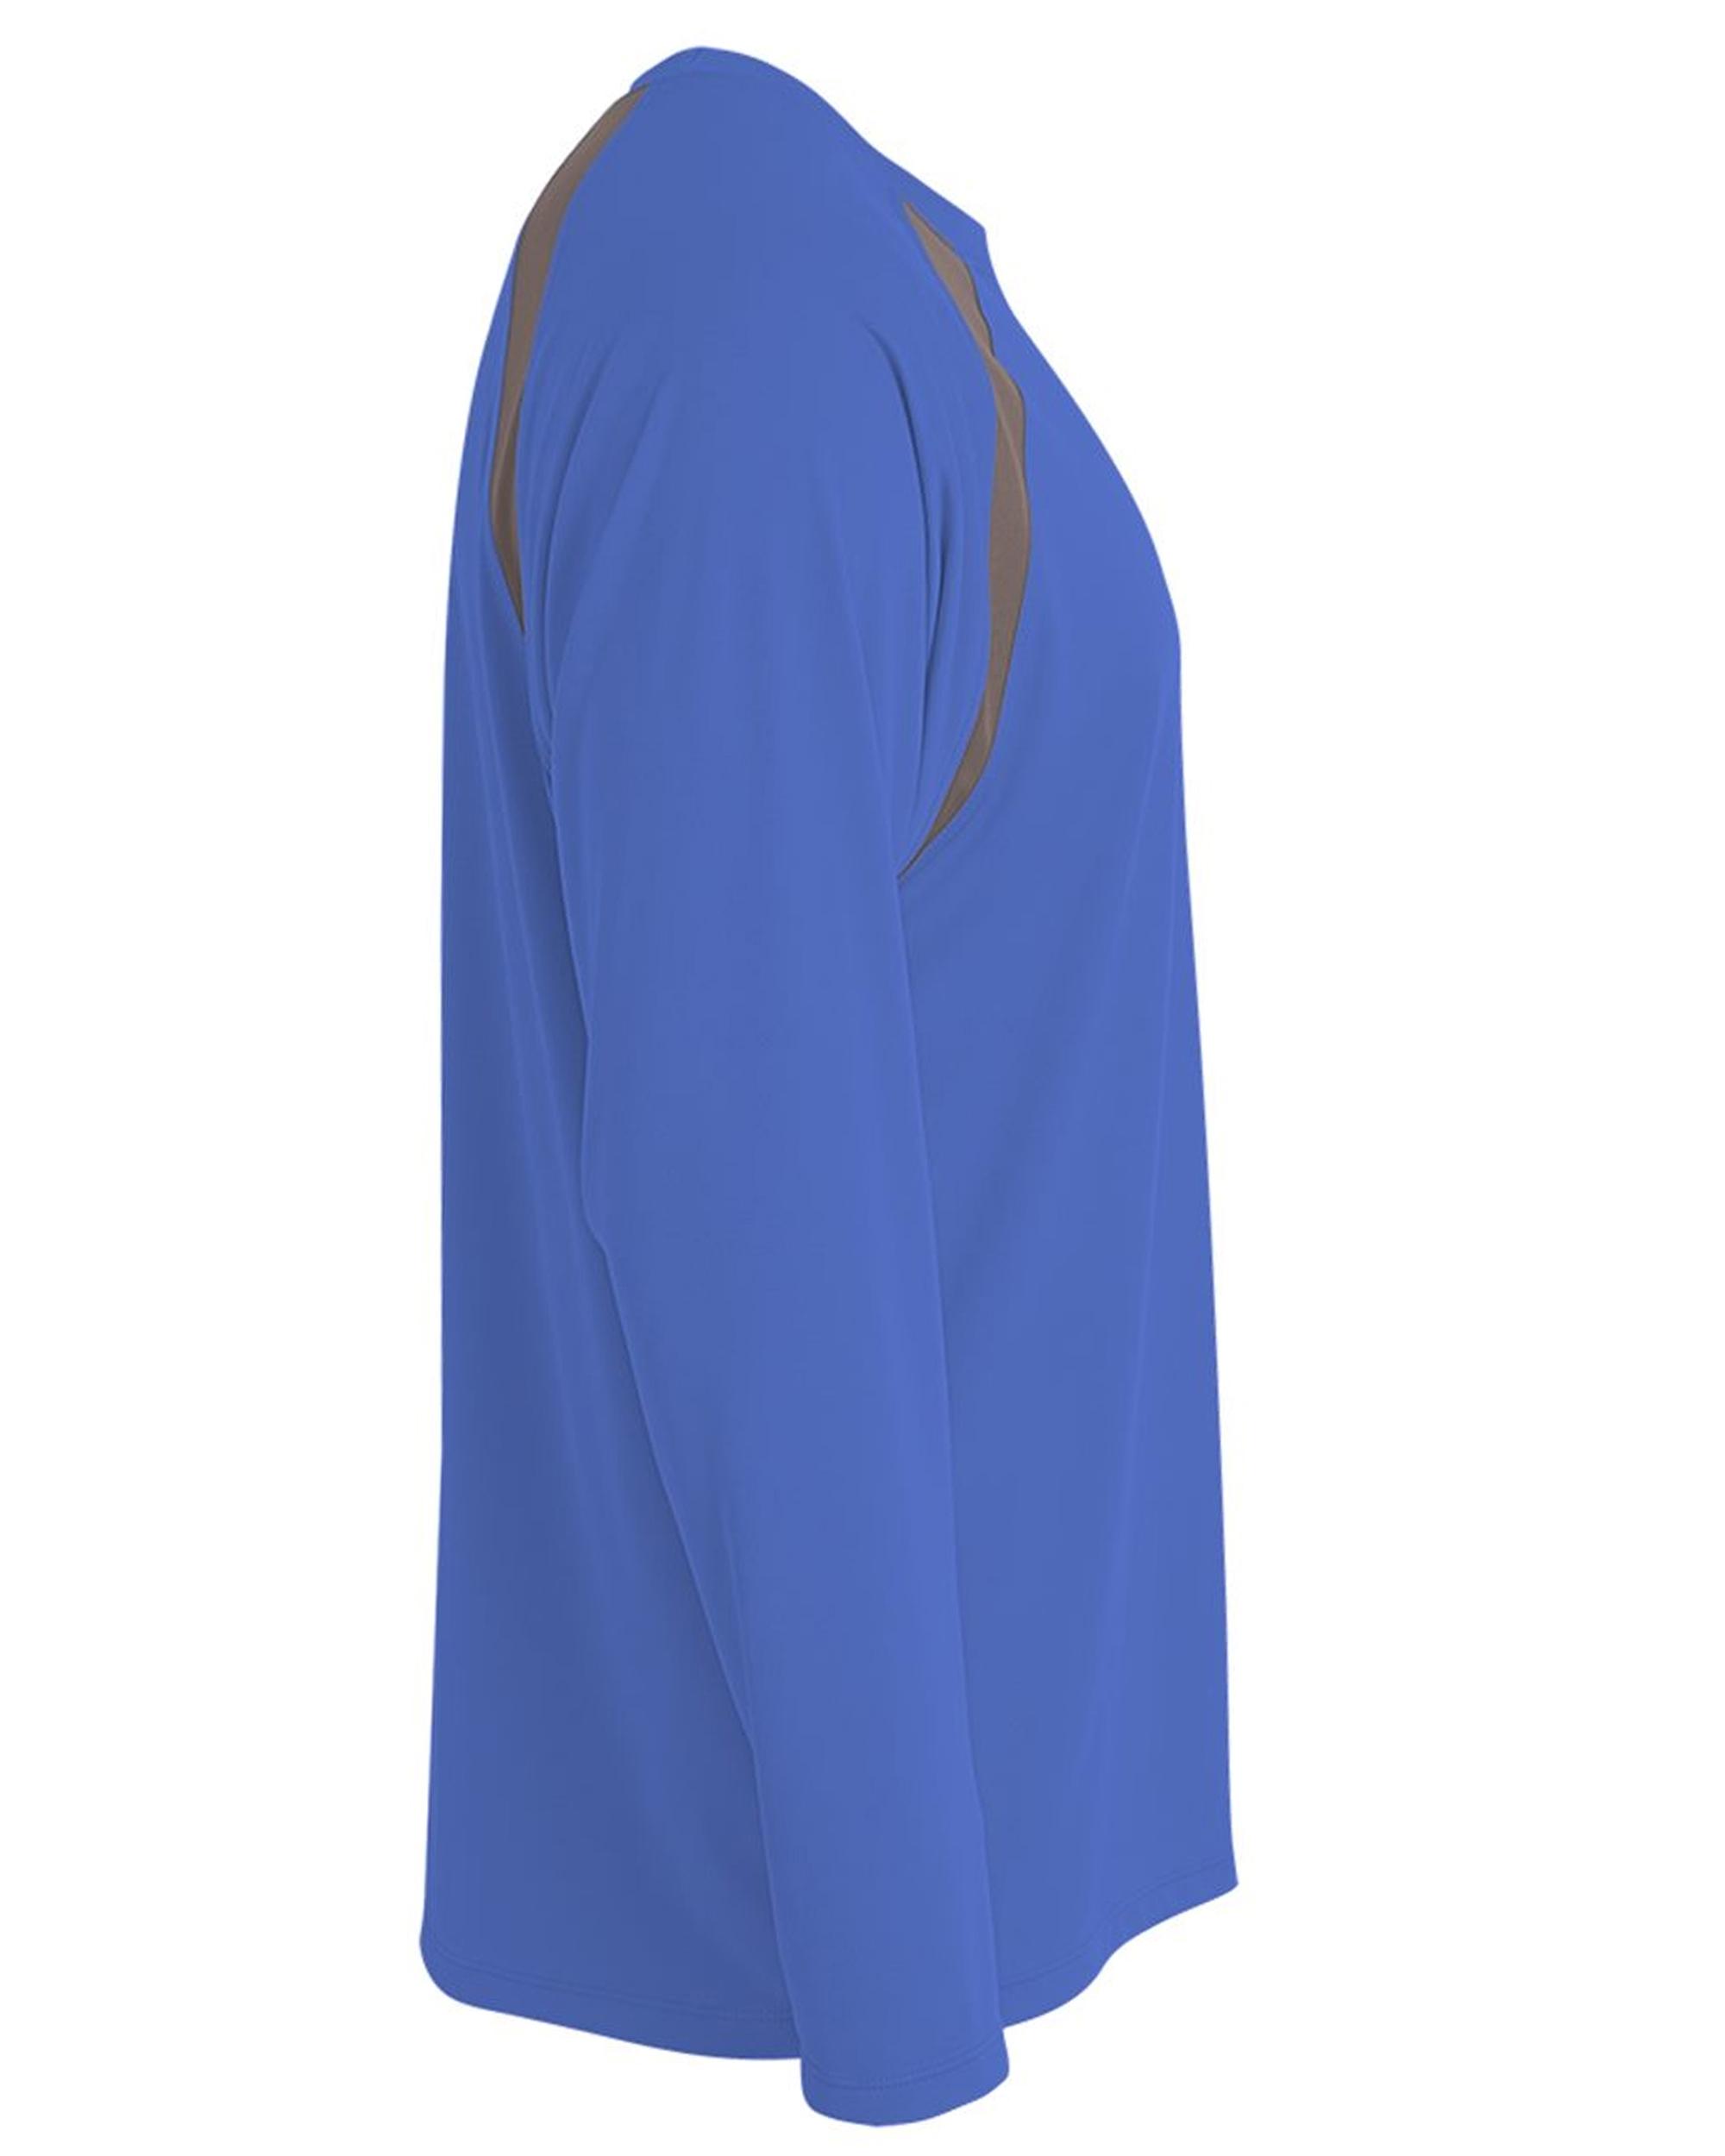 Men-039-s-Long-Sleeve-Loose-Fit-Rash-Guard-Surf-Shirt-Water-Sports-Swimwear thumbnail 19